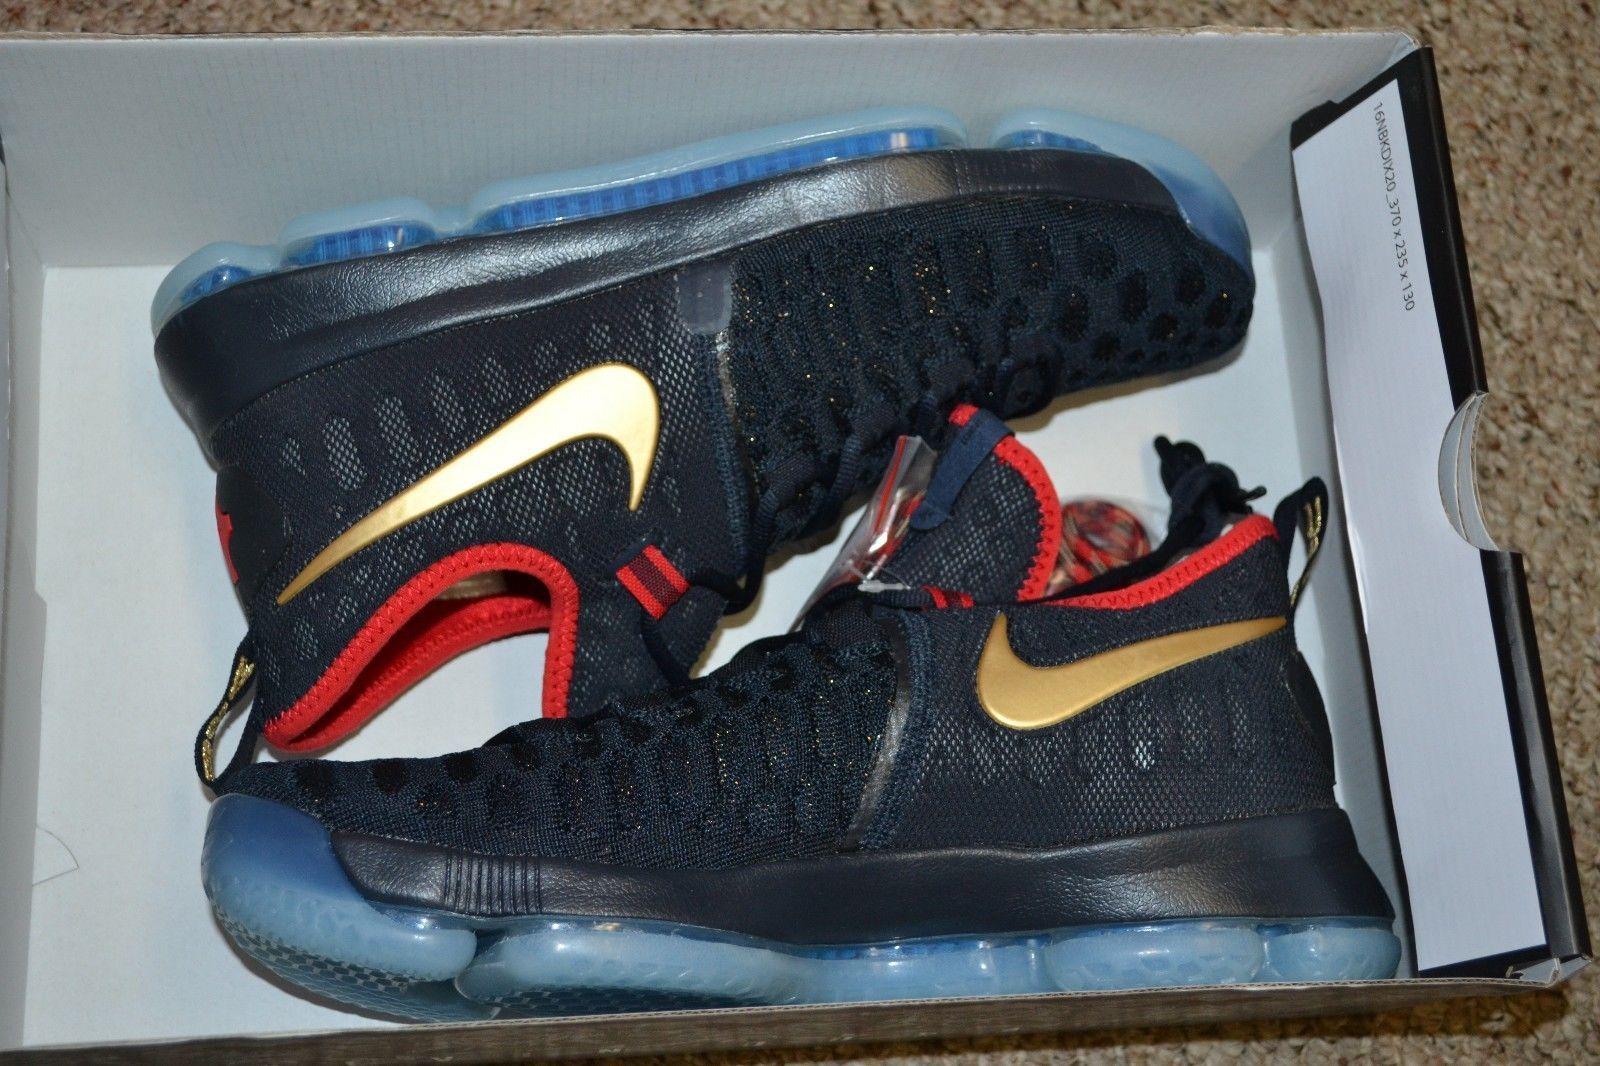 Nike Zoom Kd 9 Usa Lmtd Medalla De Oro Usa 9 Olympics 843396 470 Sz 10 No Box 671b57